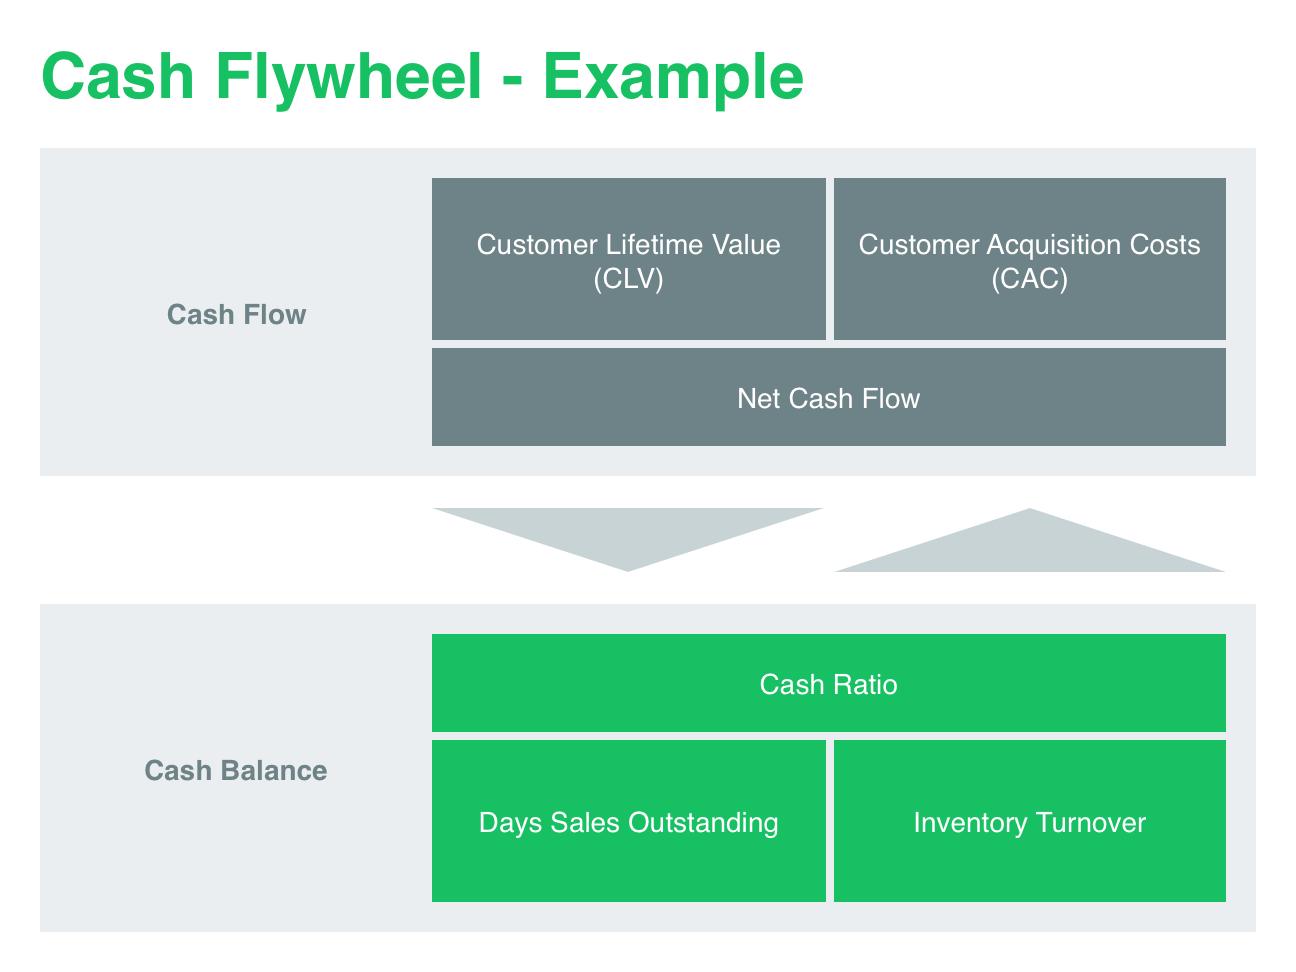 cash-flywheel-with-example-analytics